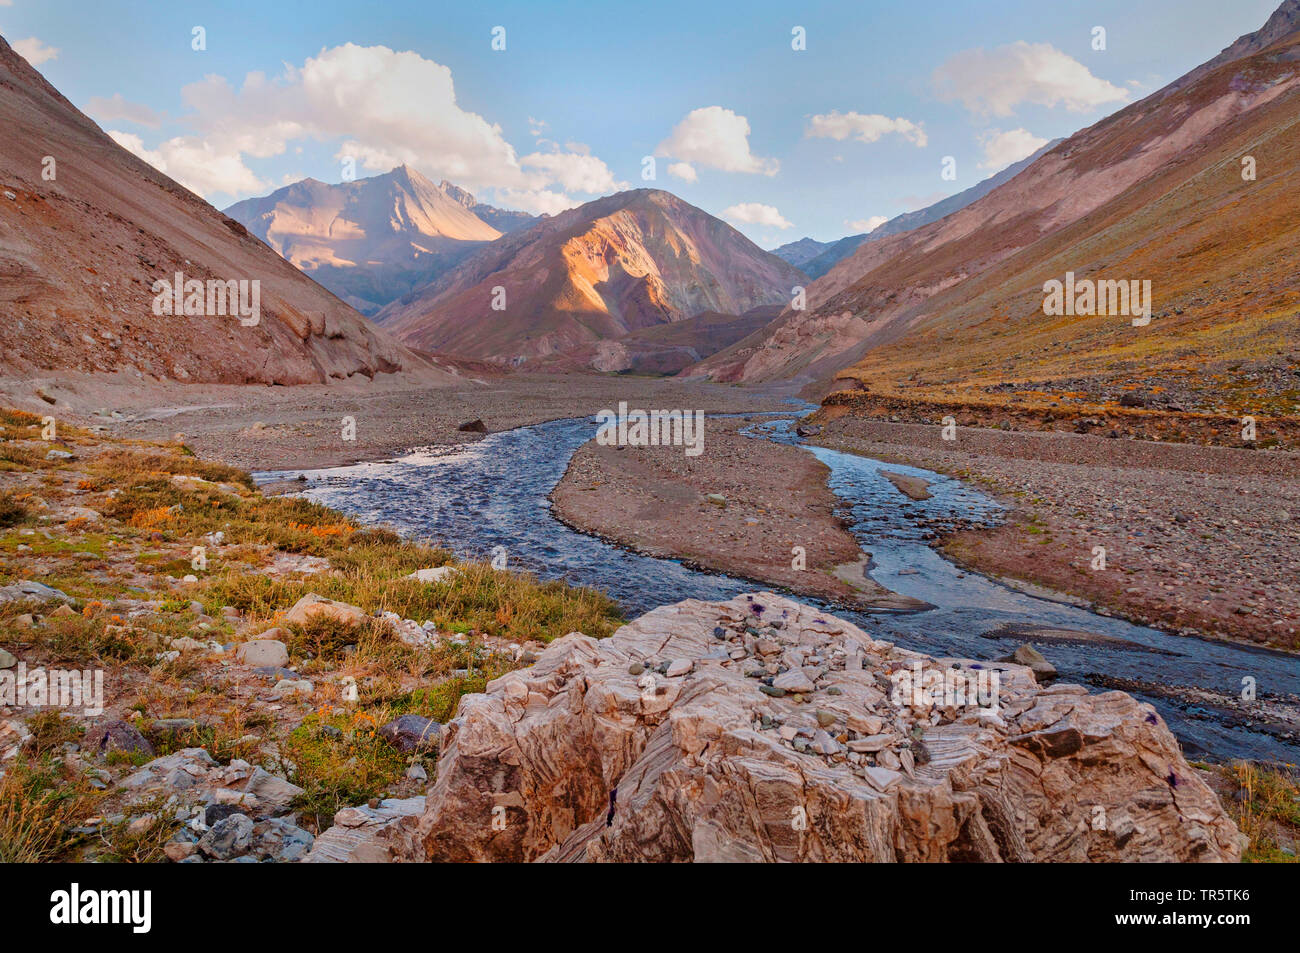 Flusslauf des Rio del Maipo in den chilenischen Anden, Chile, Anden   Maipo River in the Chilean Andes, Chile, Andes   BLWS465292.jpg [ (c) blickwinke - Stock Image